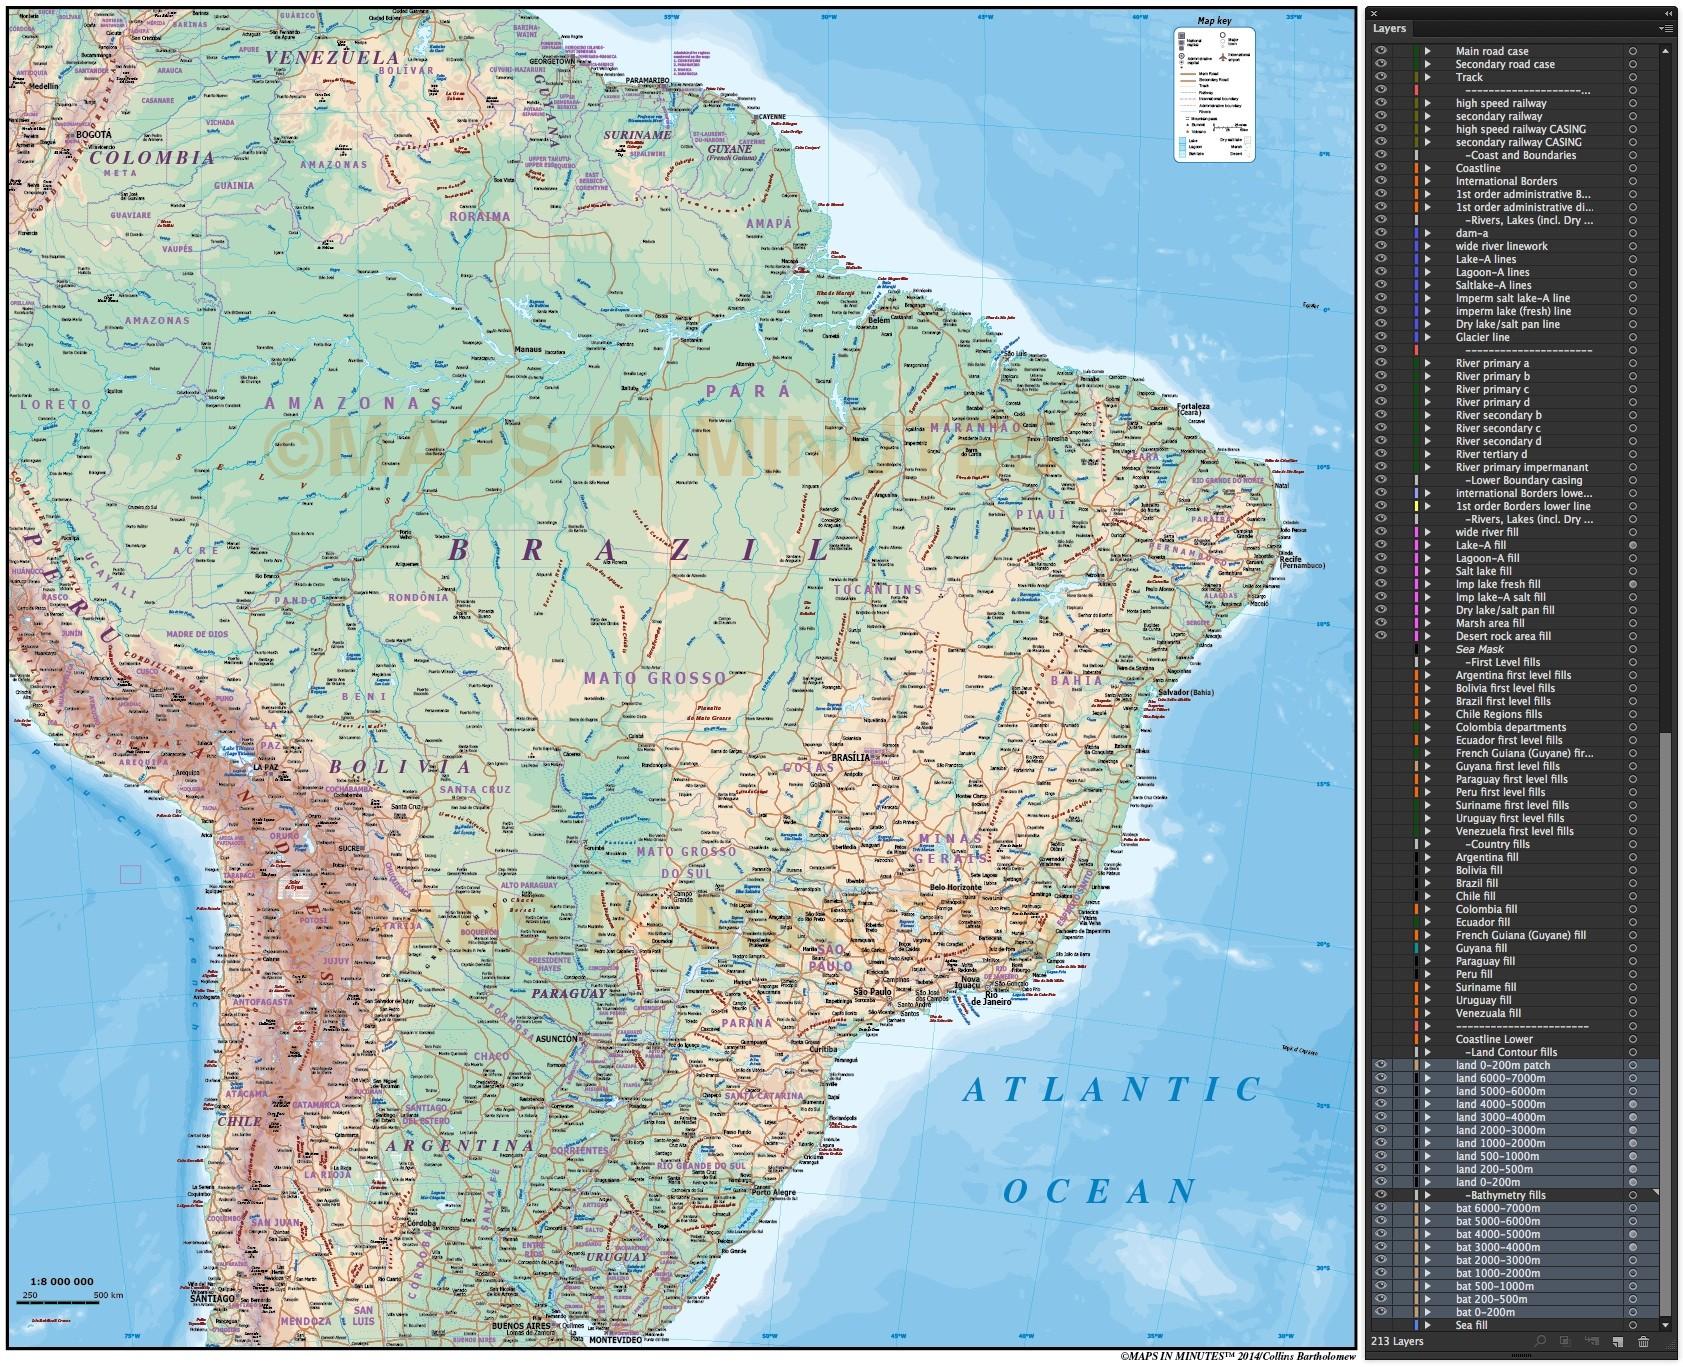 Digital vector brazil deluxe political road rail map plus land and digital vector brazil map deluxe political road rail map showing land sea floor publicscrutiny Choice Image